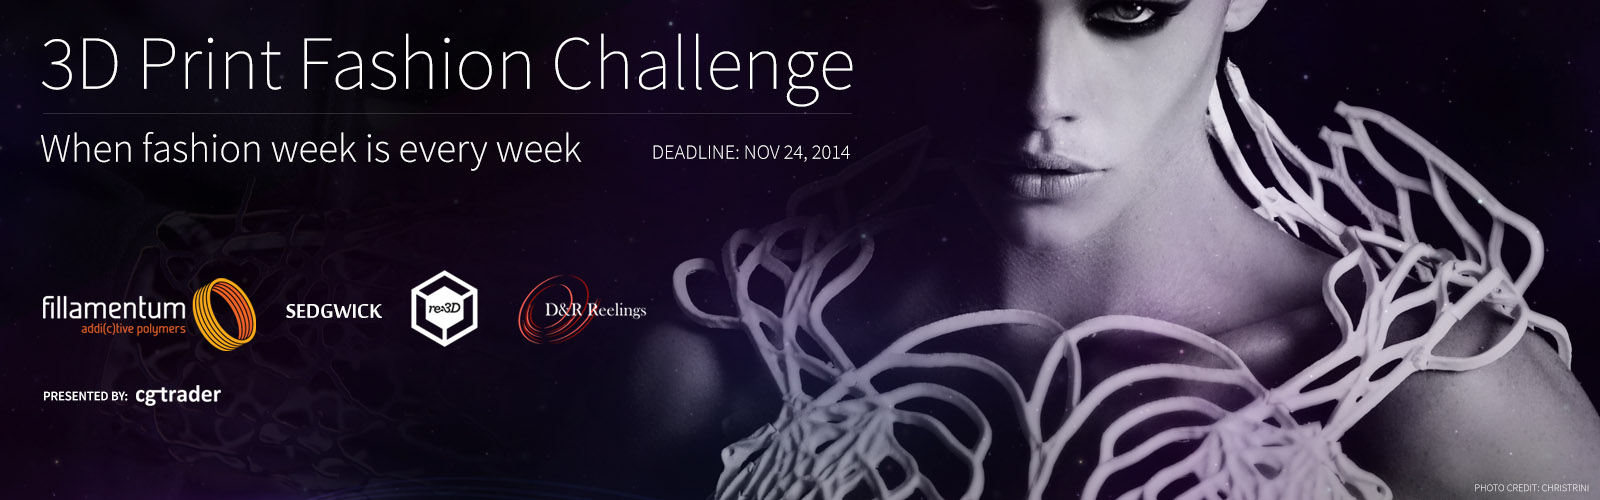 3D Fashion Challenge